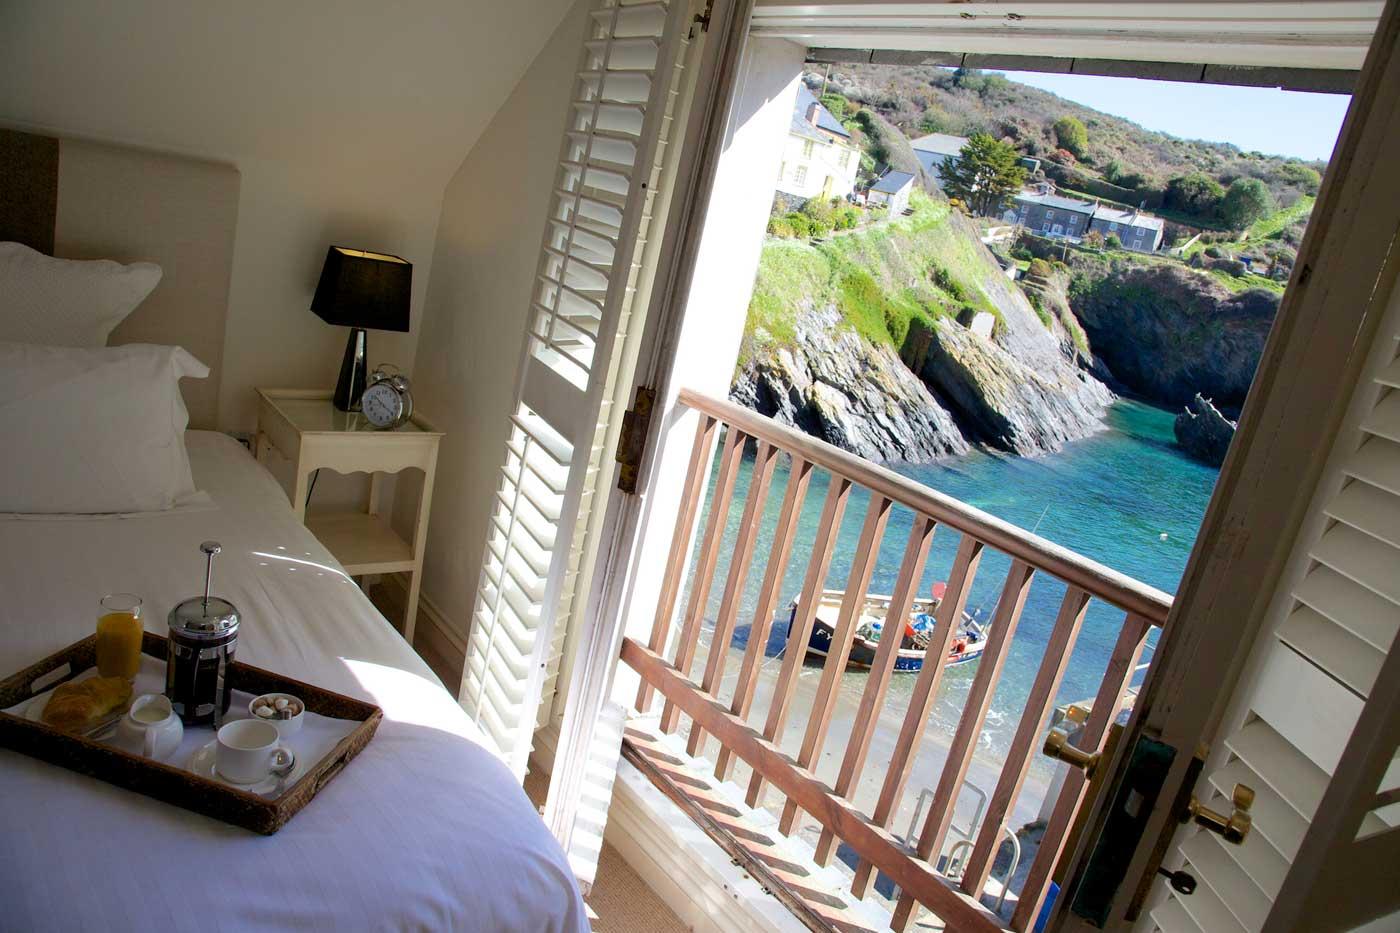 The Lugger, Truro bedroom sea views